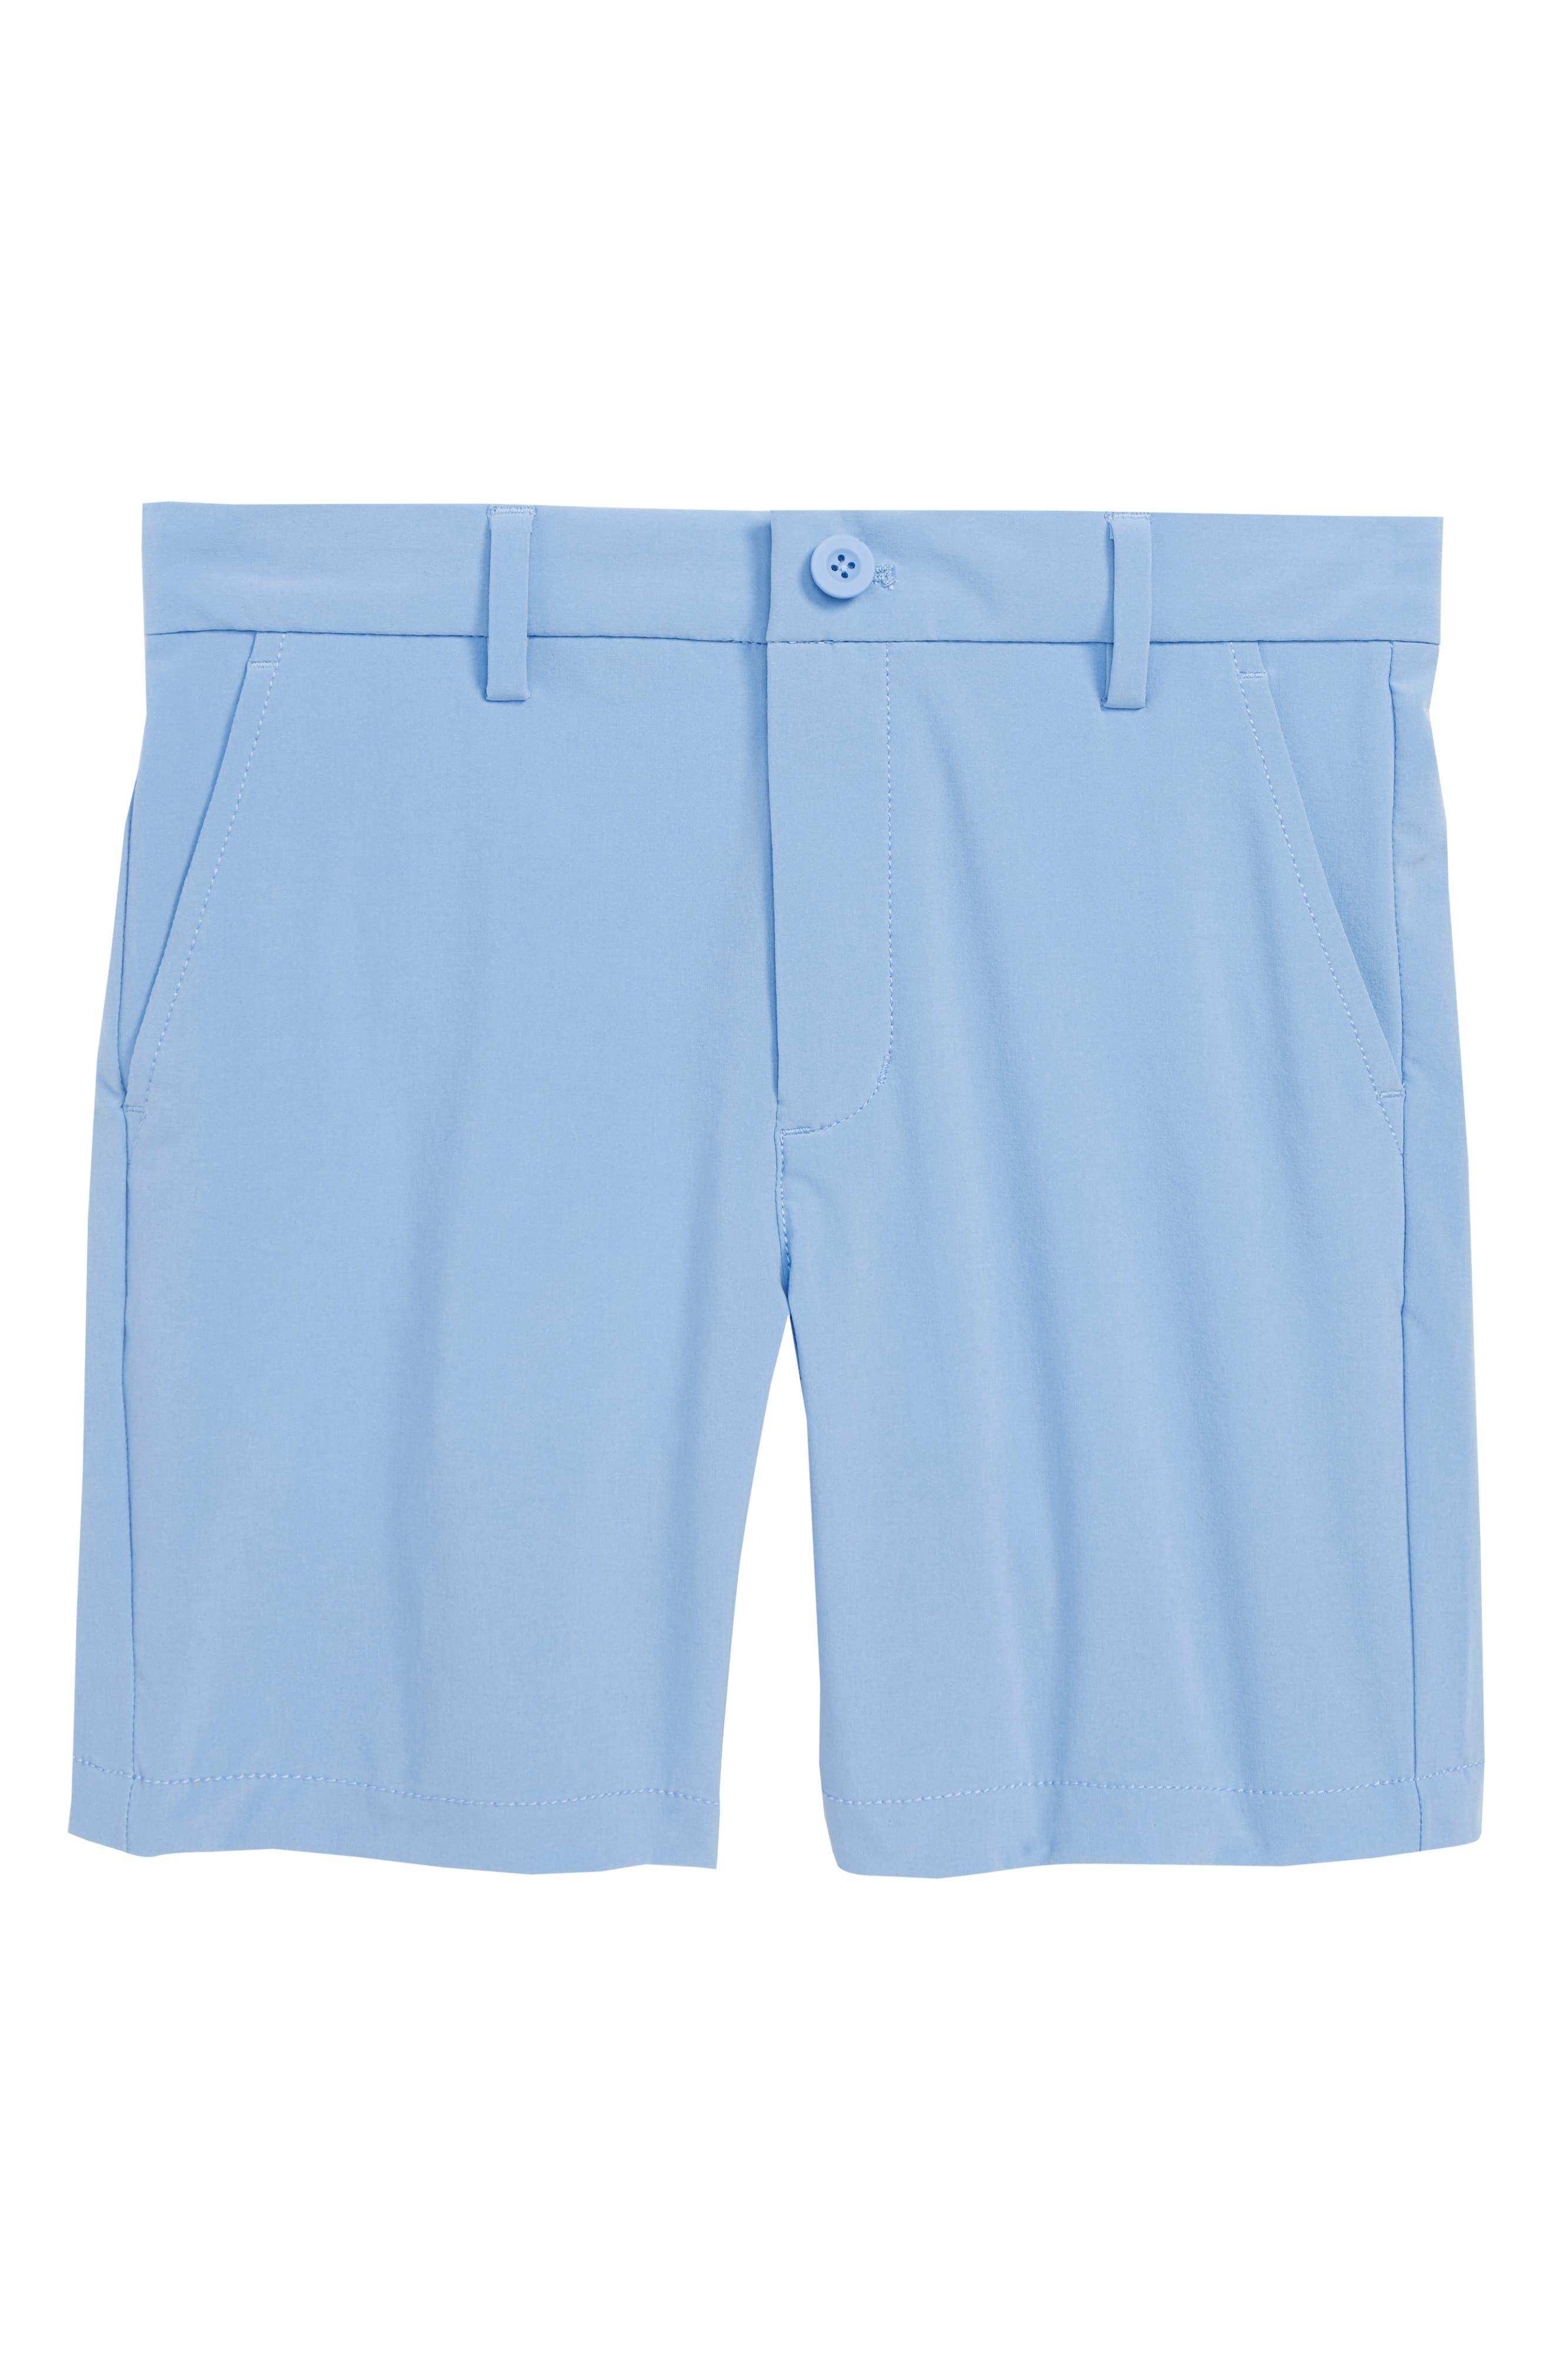 Performance Breaker Shorts,                         Main,                         color, OCEAN BREEZE